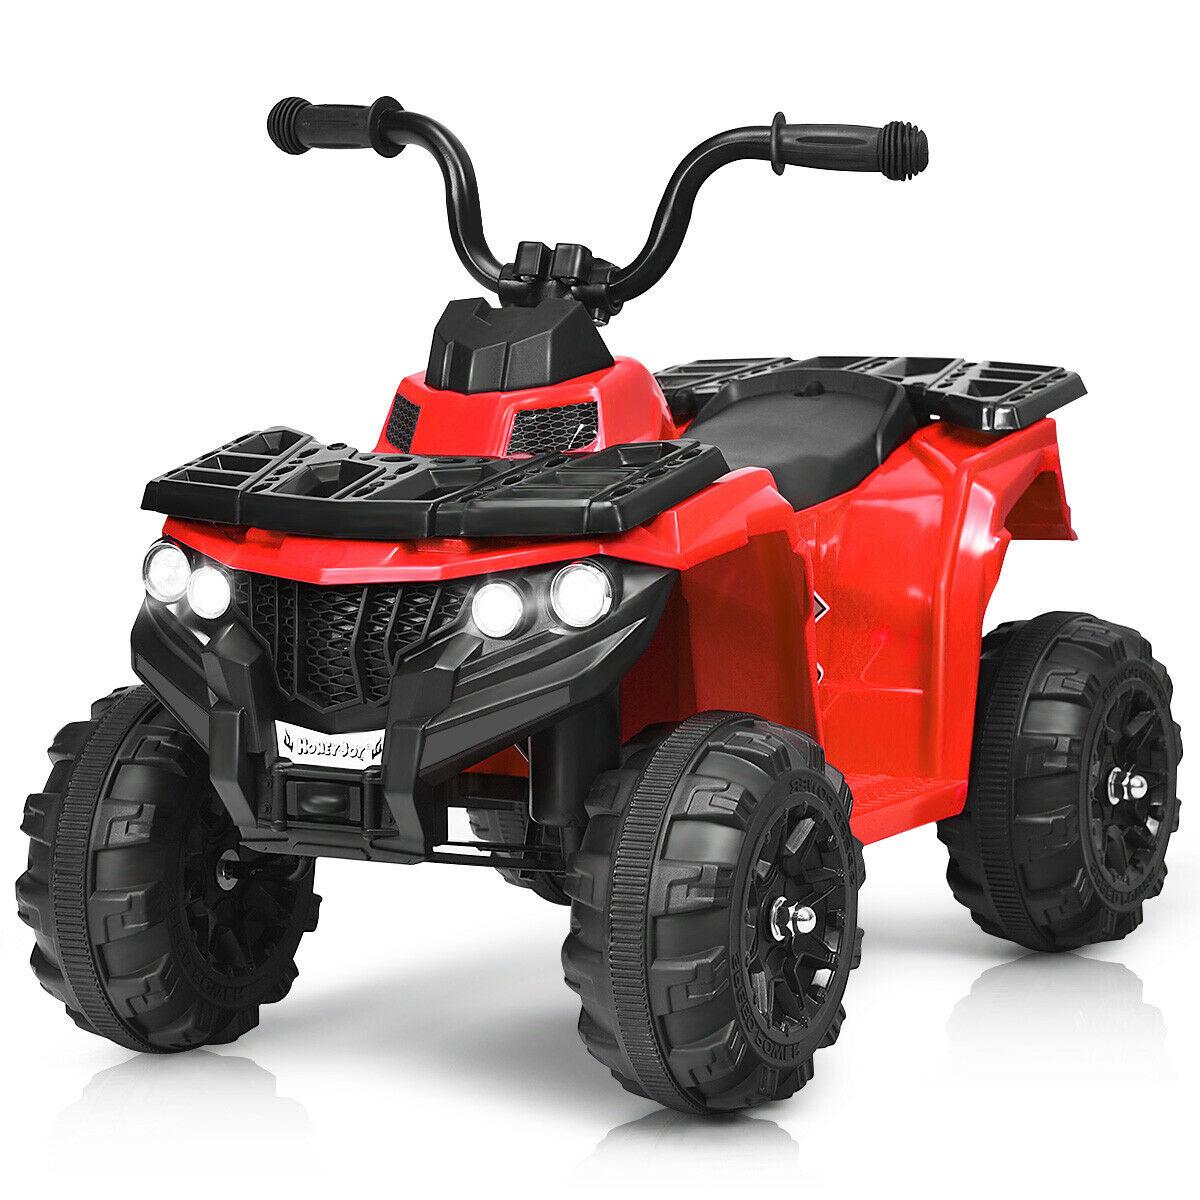 Gymax 6V Battery Powered Kids Ride On ATV 4-Wheeler Quad w/ MP3 & LED Headlight Red